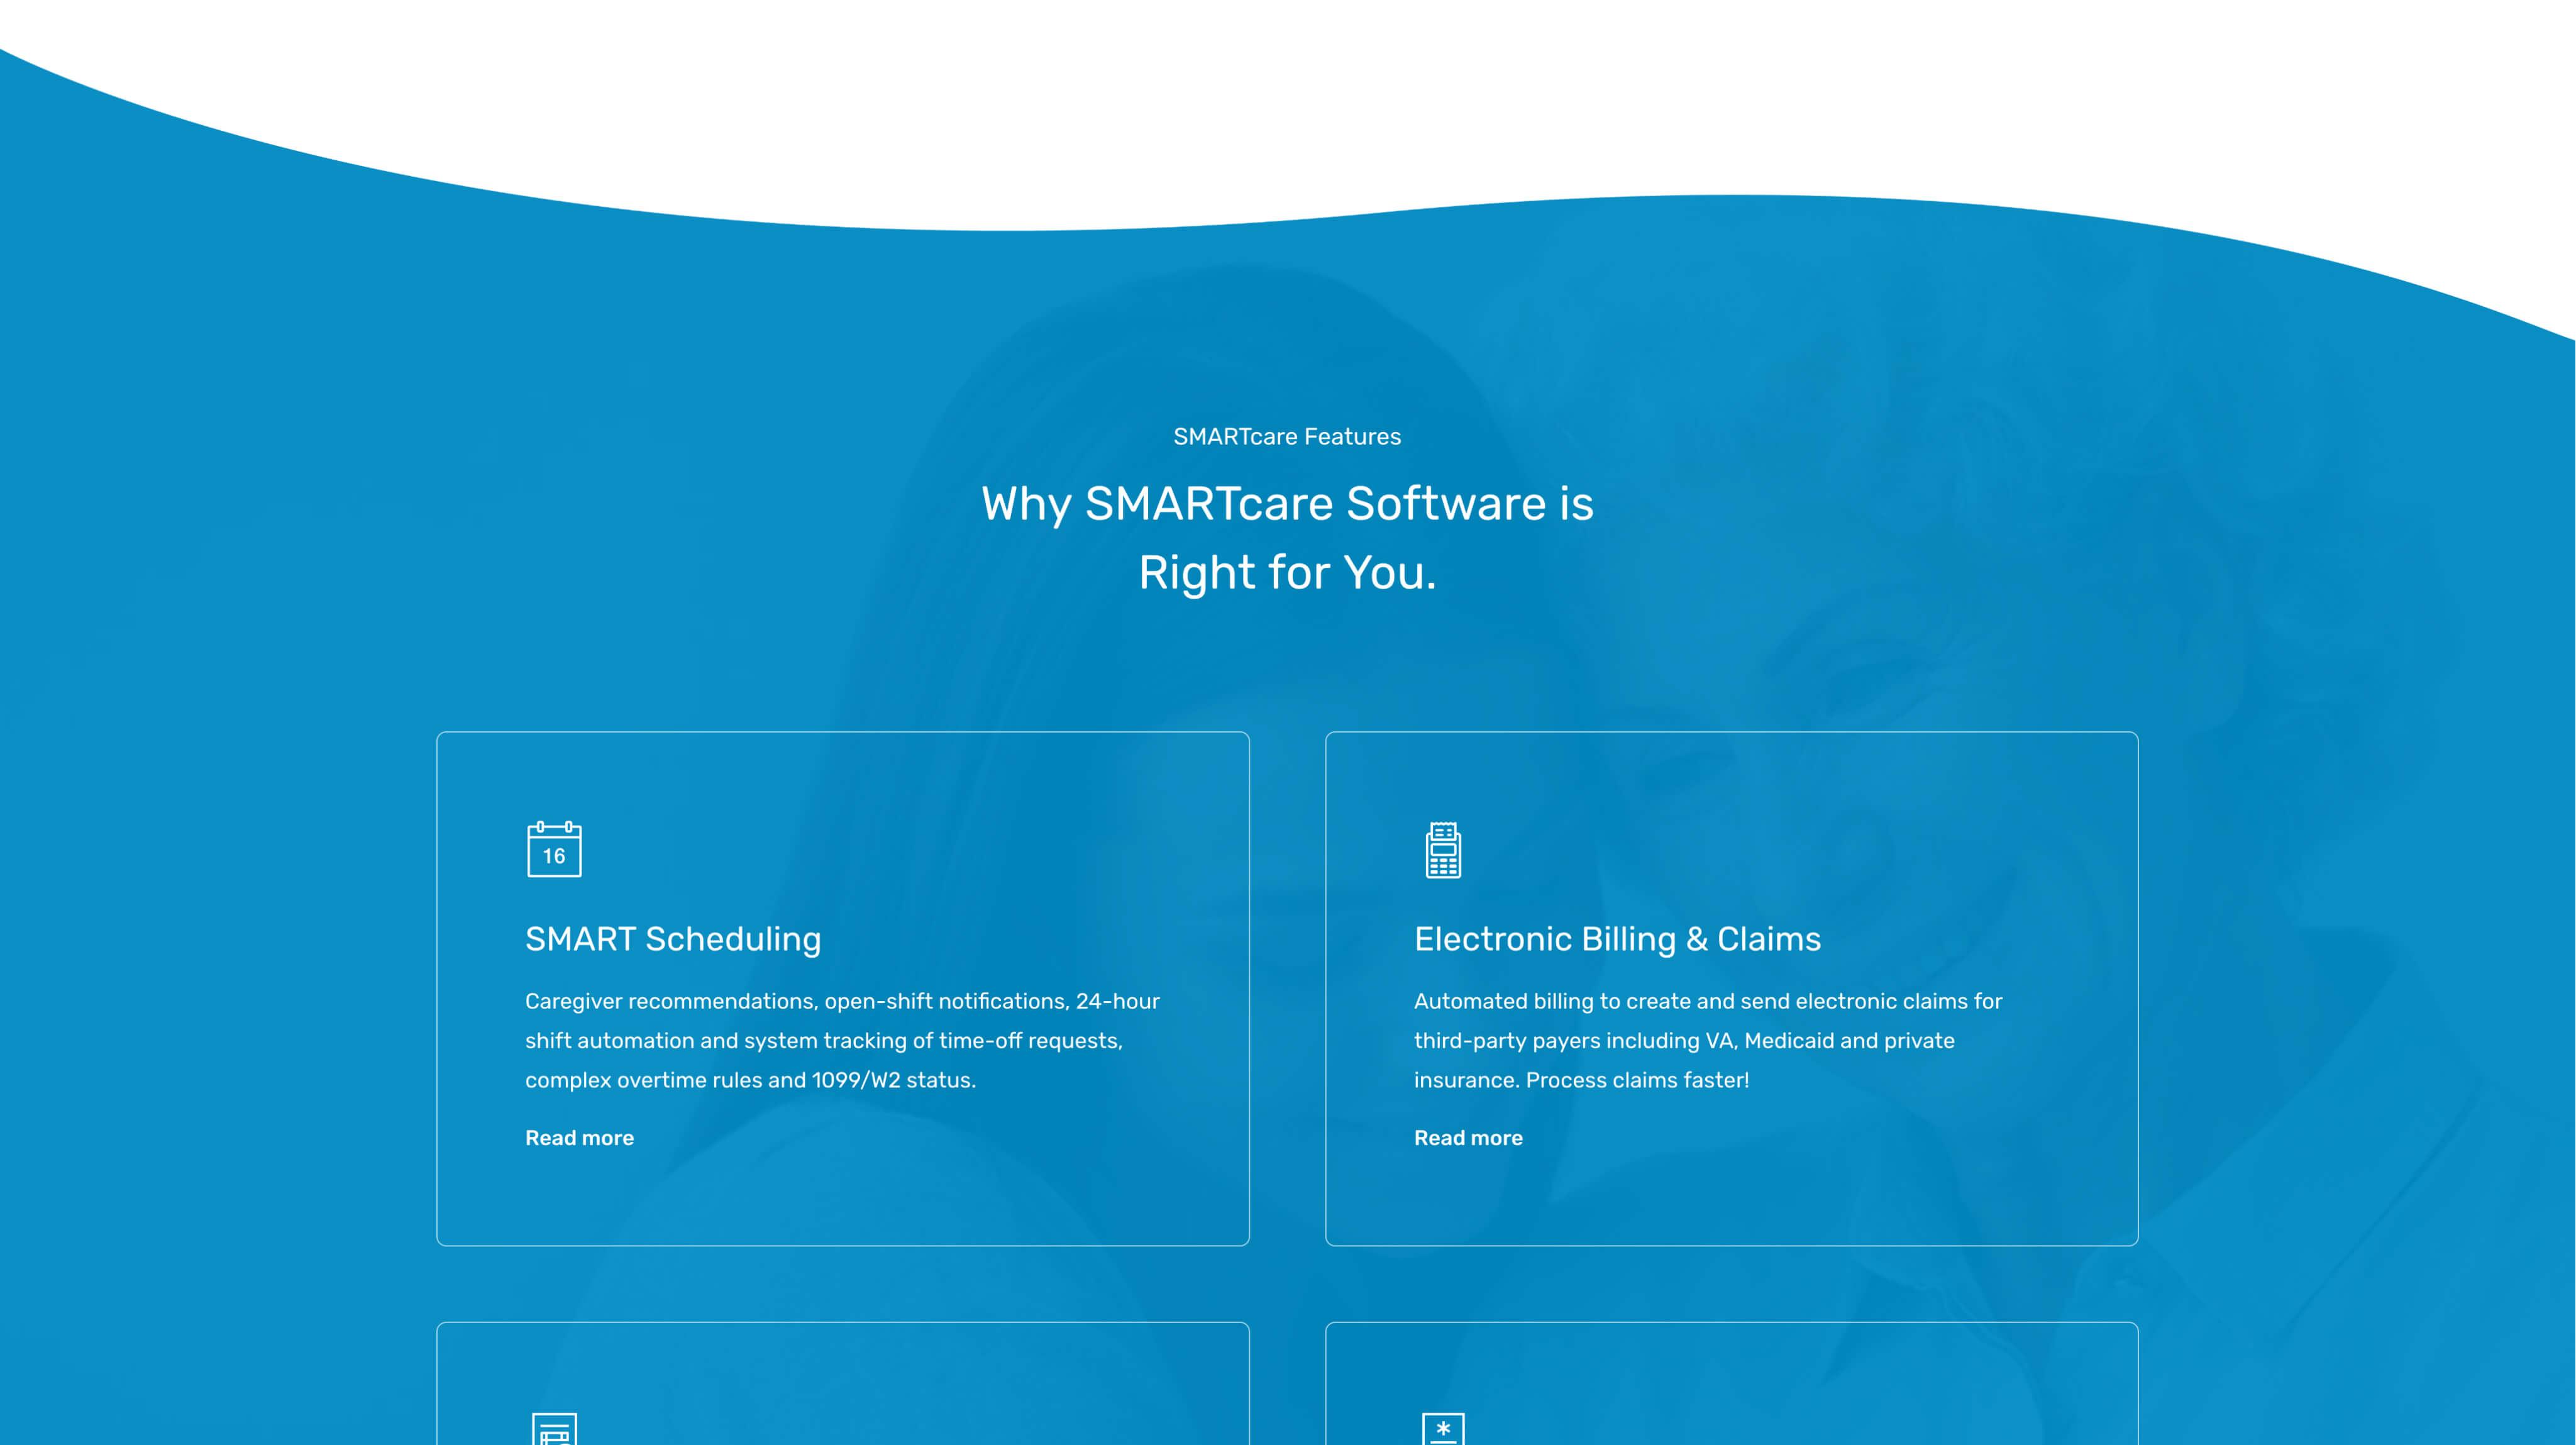 Custom WordPress Website Design & Development - Features Section - SMARTcare Software